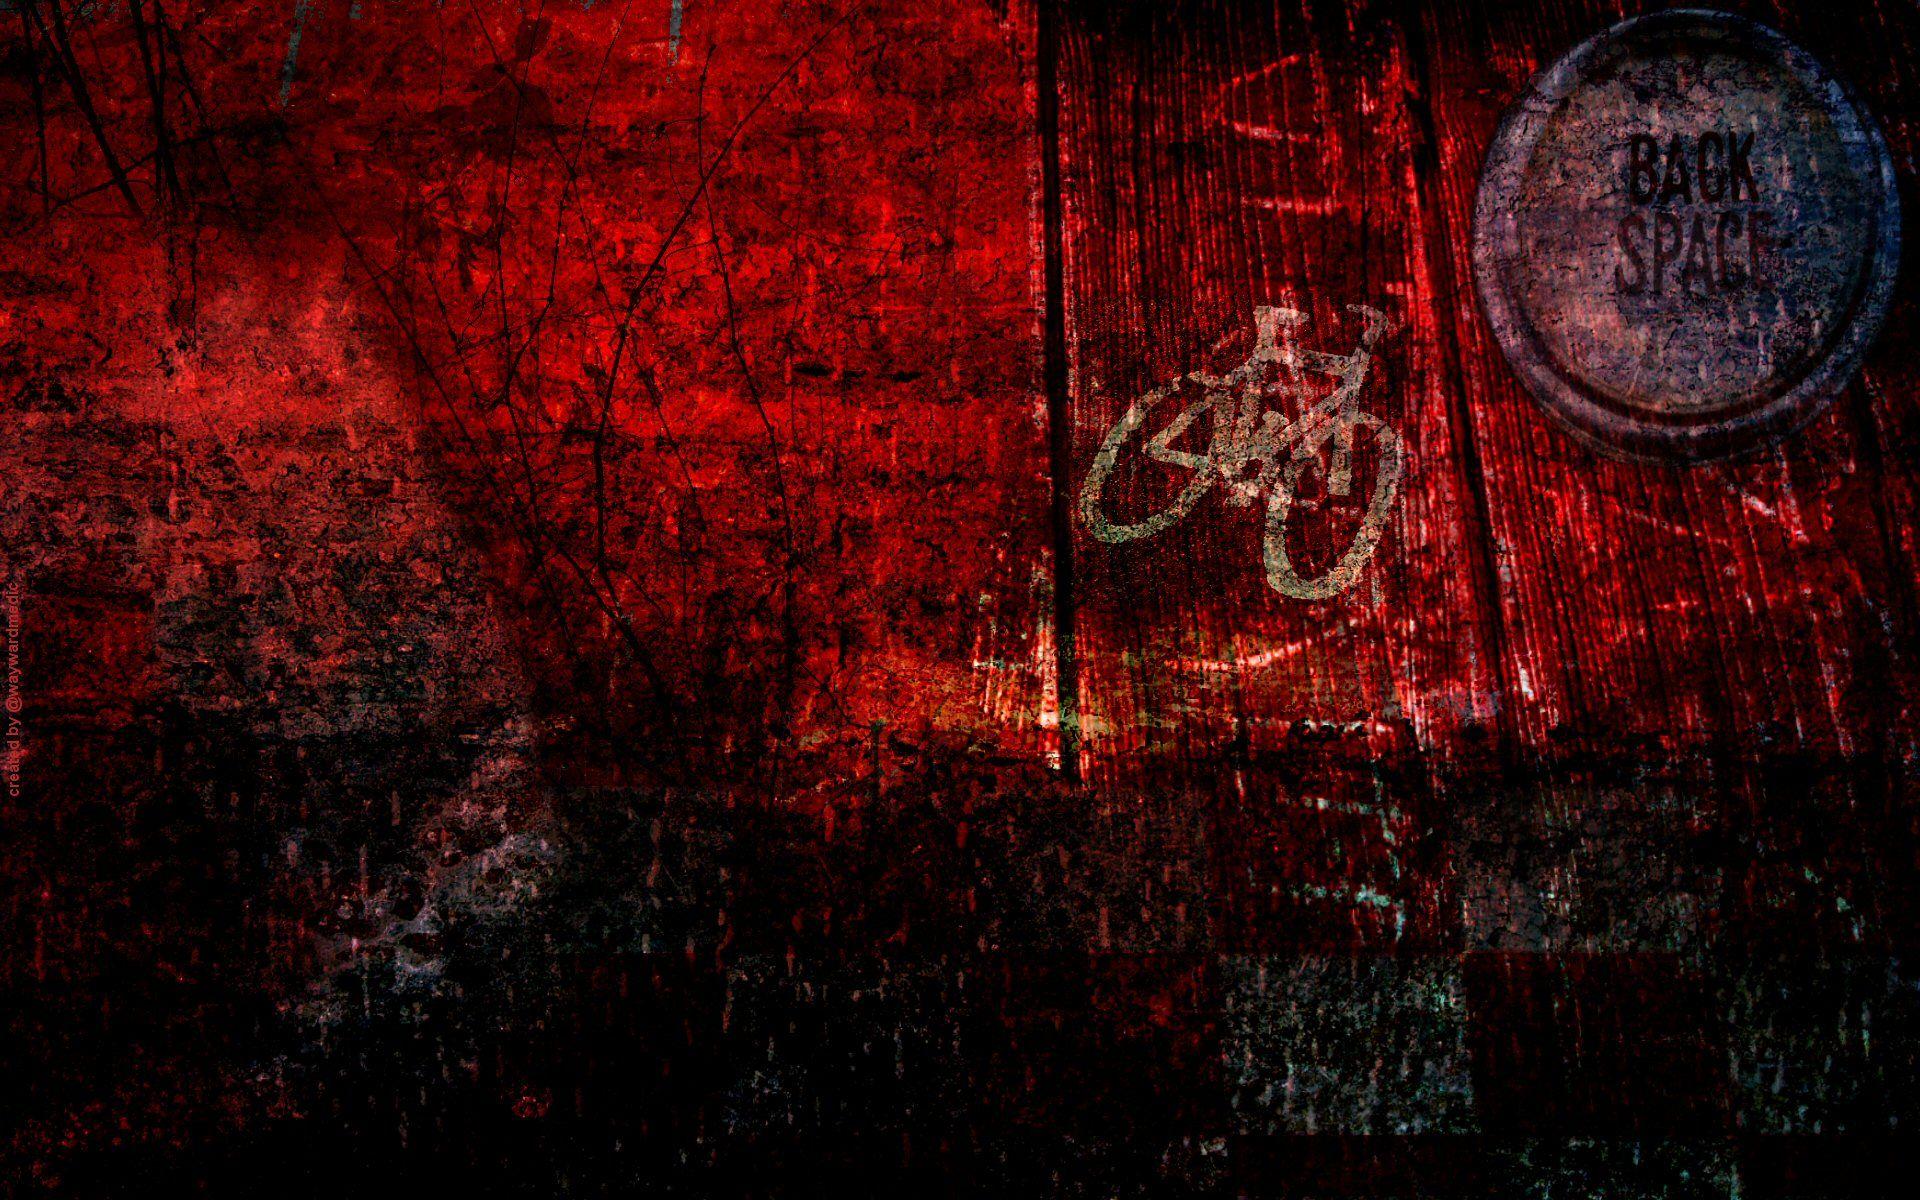 Wallpapers Tumblr Grunge Chinese